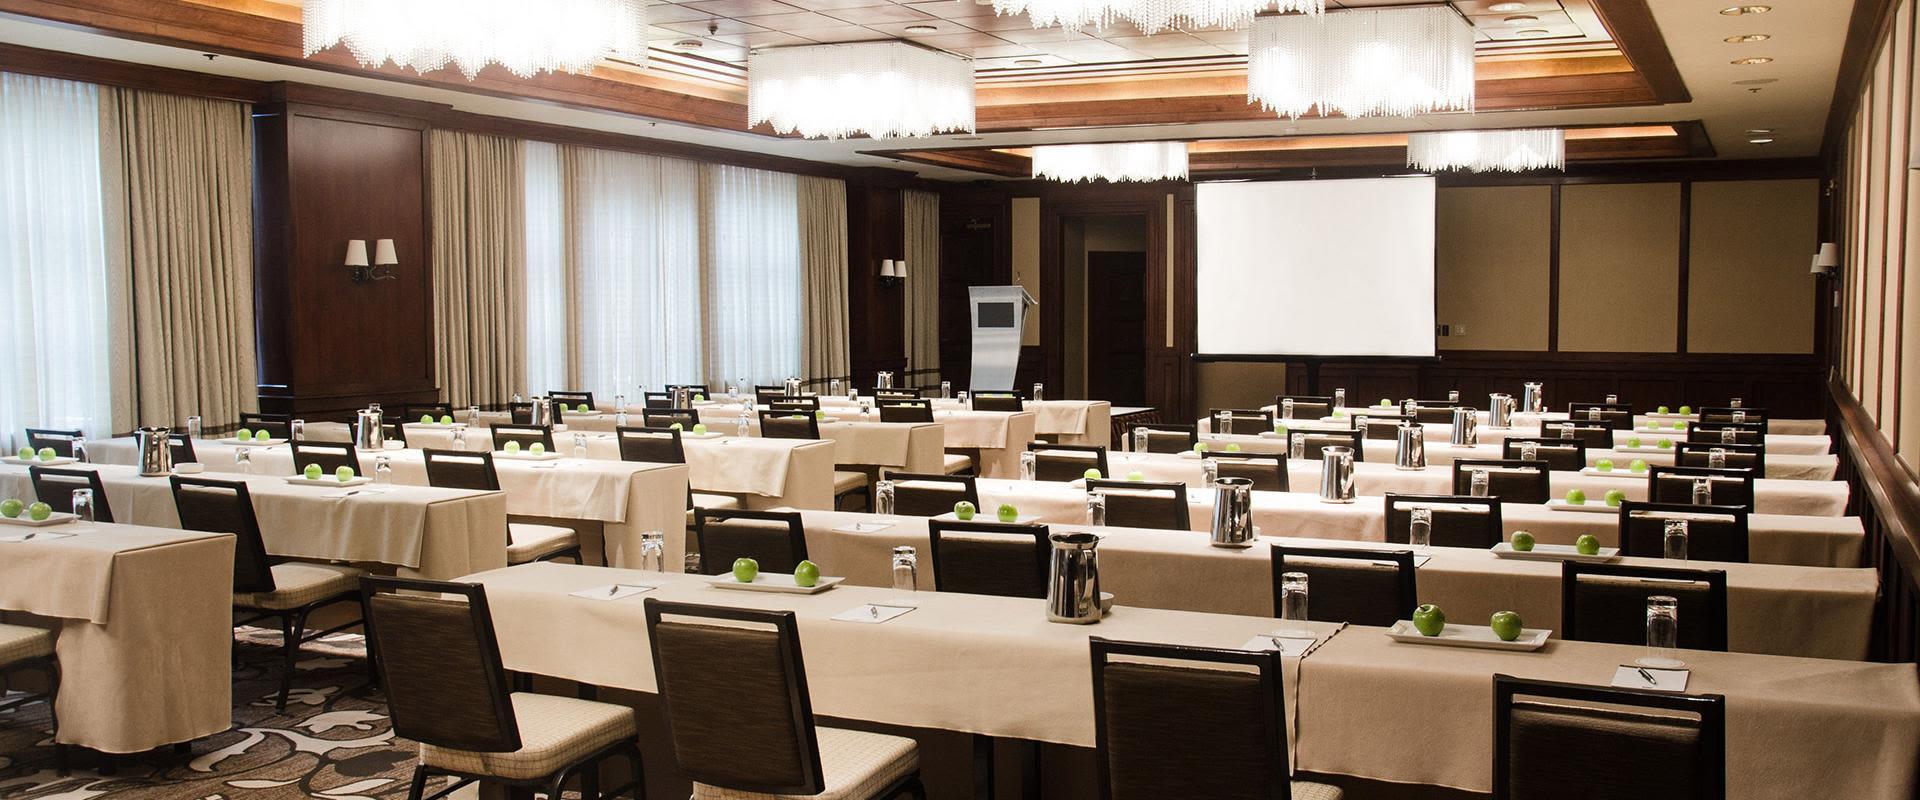 Yorkville Toronto Meeting Class Room